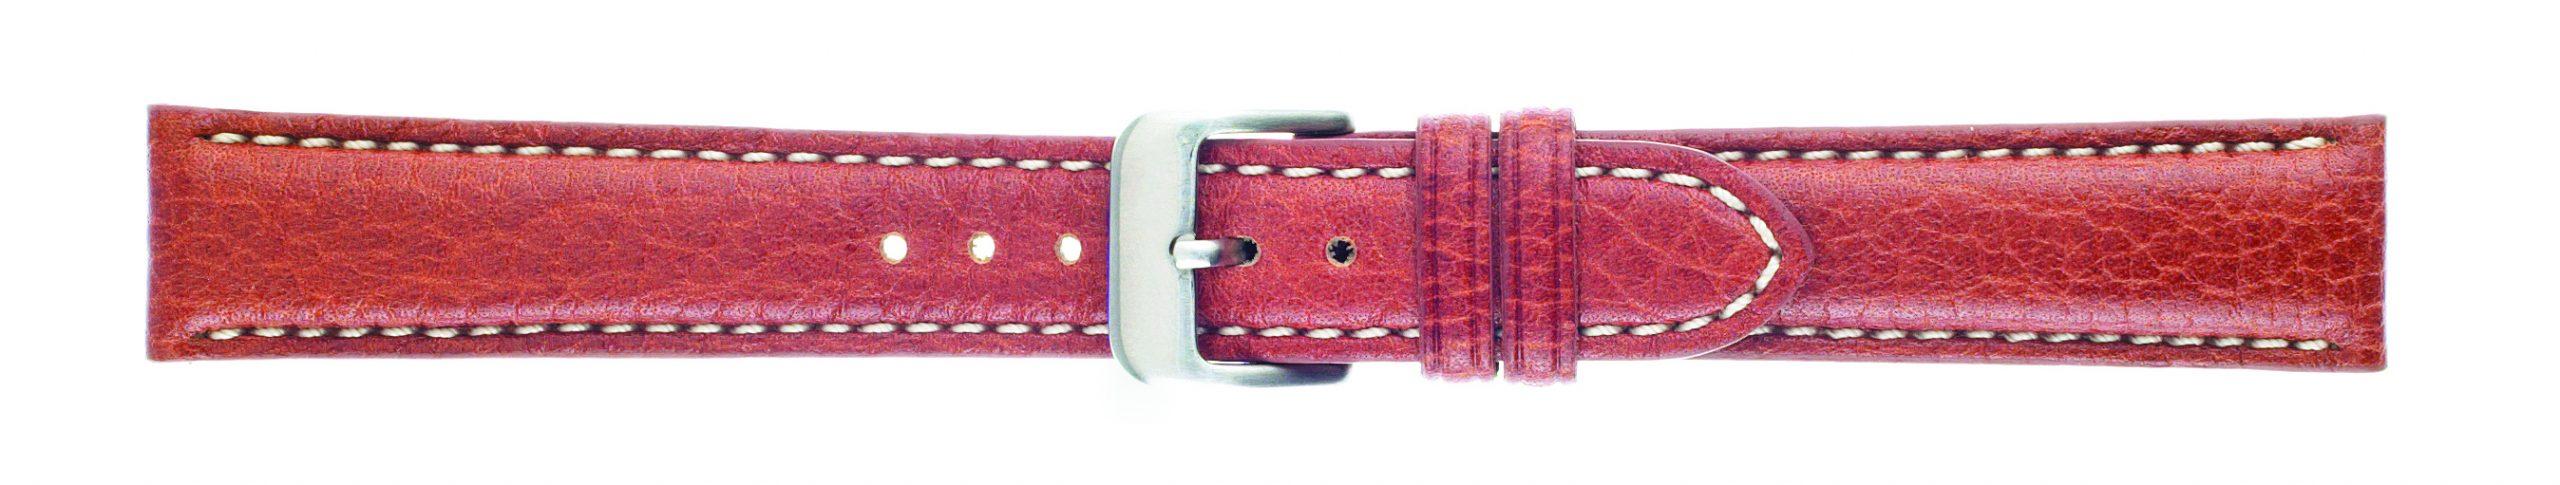 18mm Buffalo Chrono Honey Brown Leather Strap-0